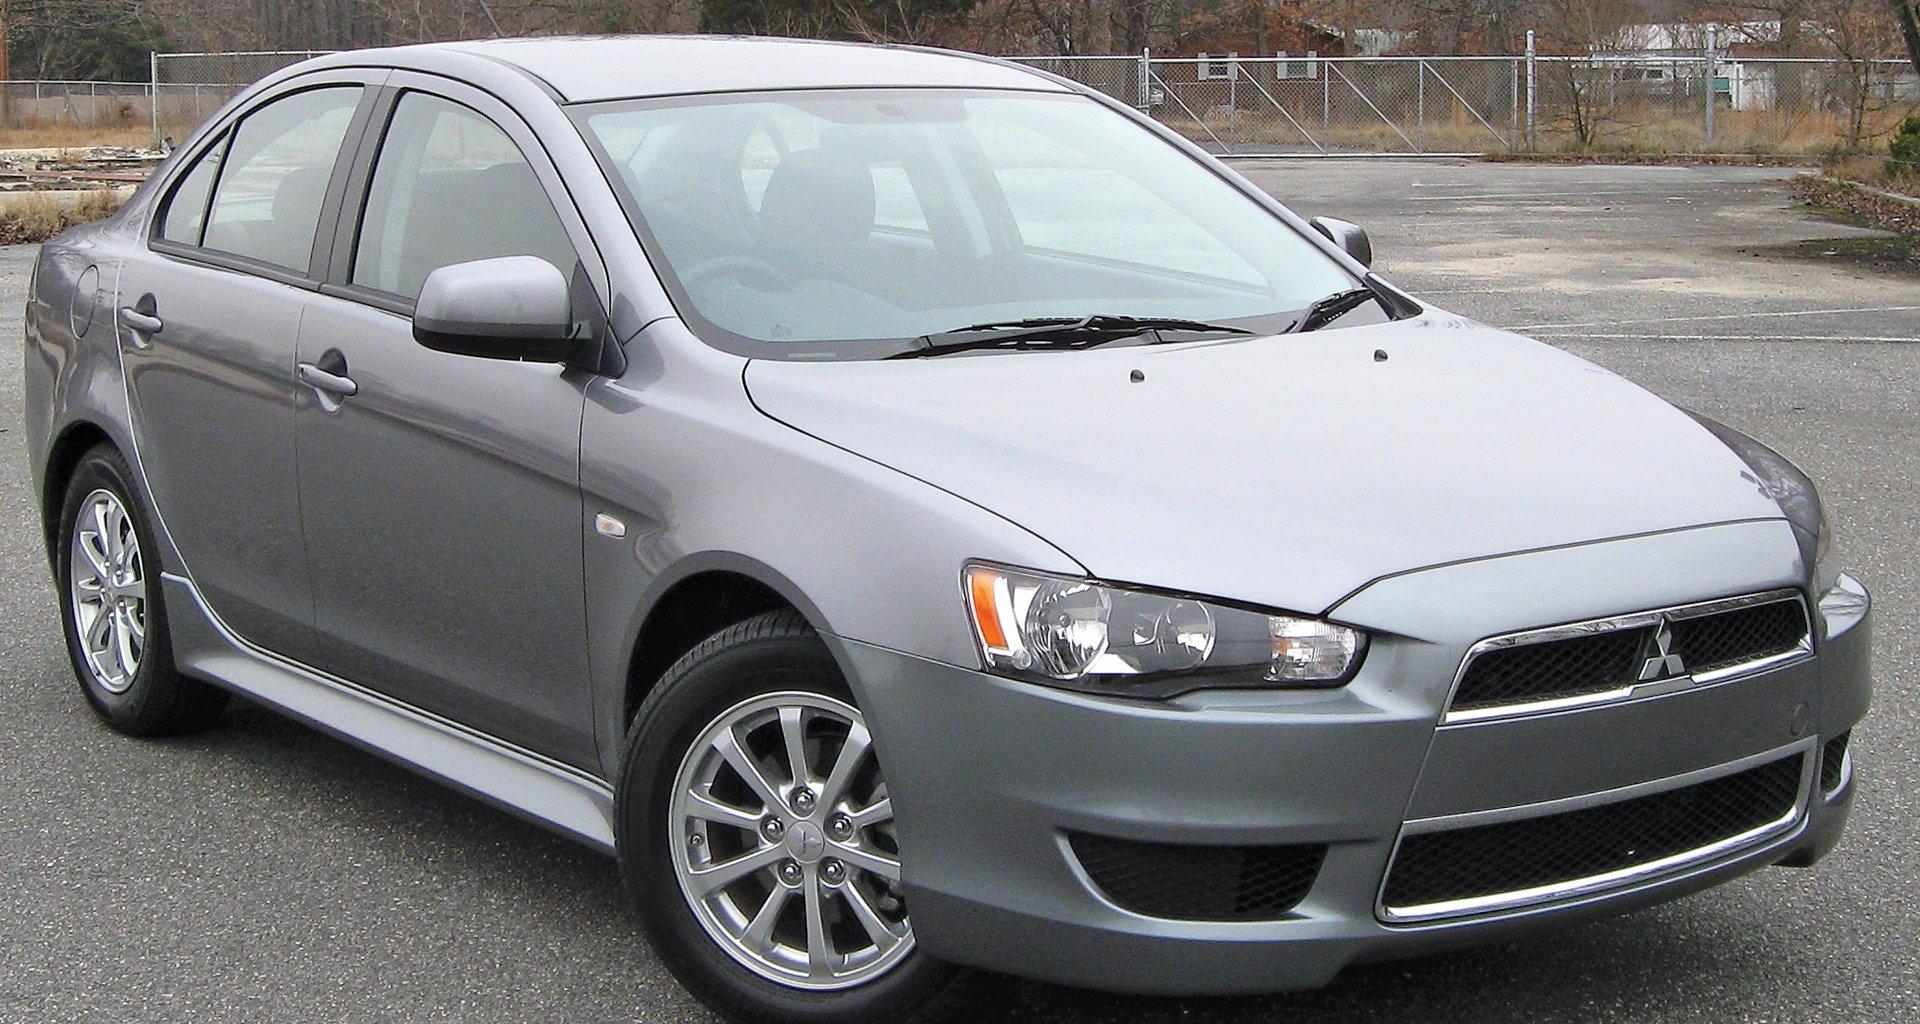 Grey Mitsubishi